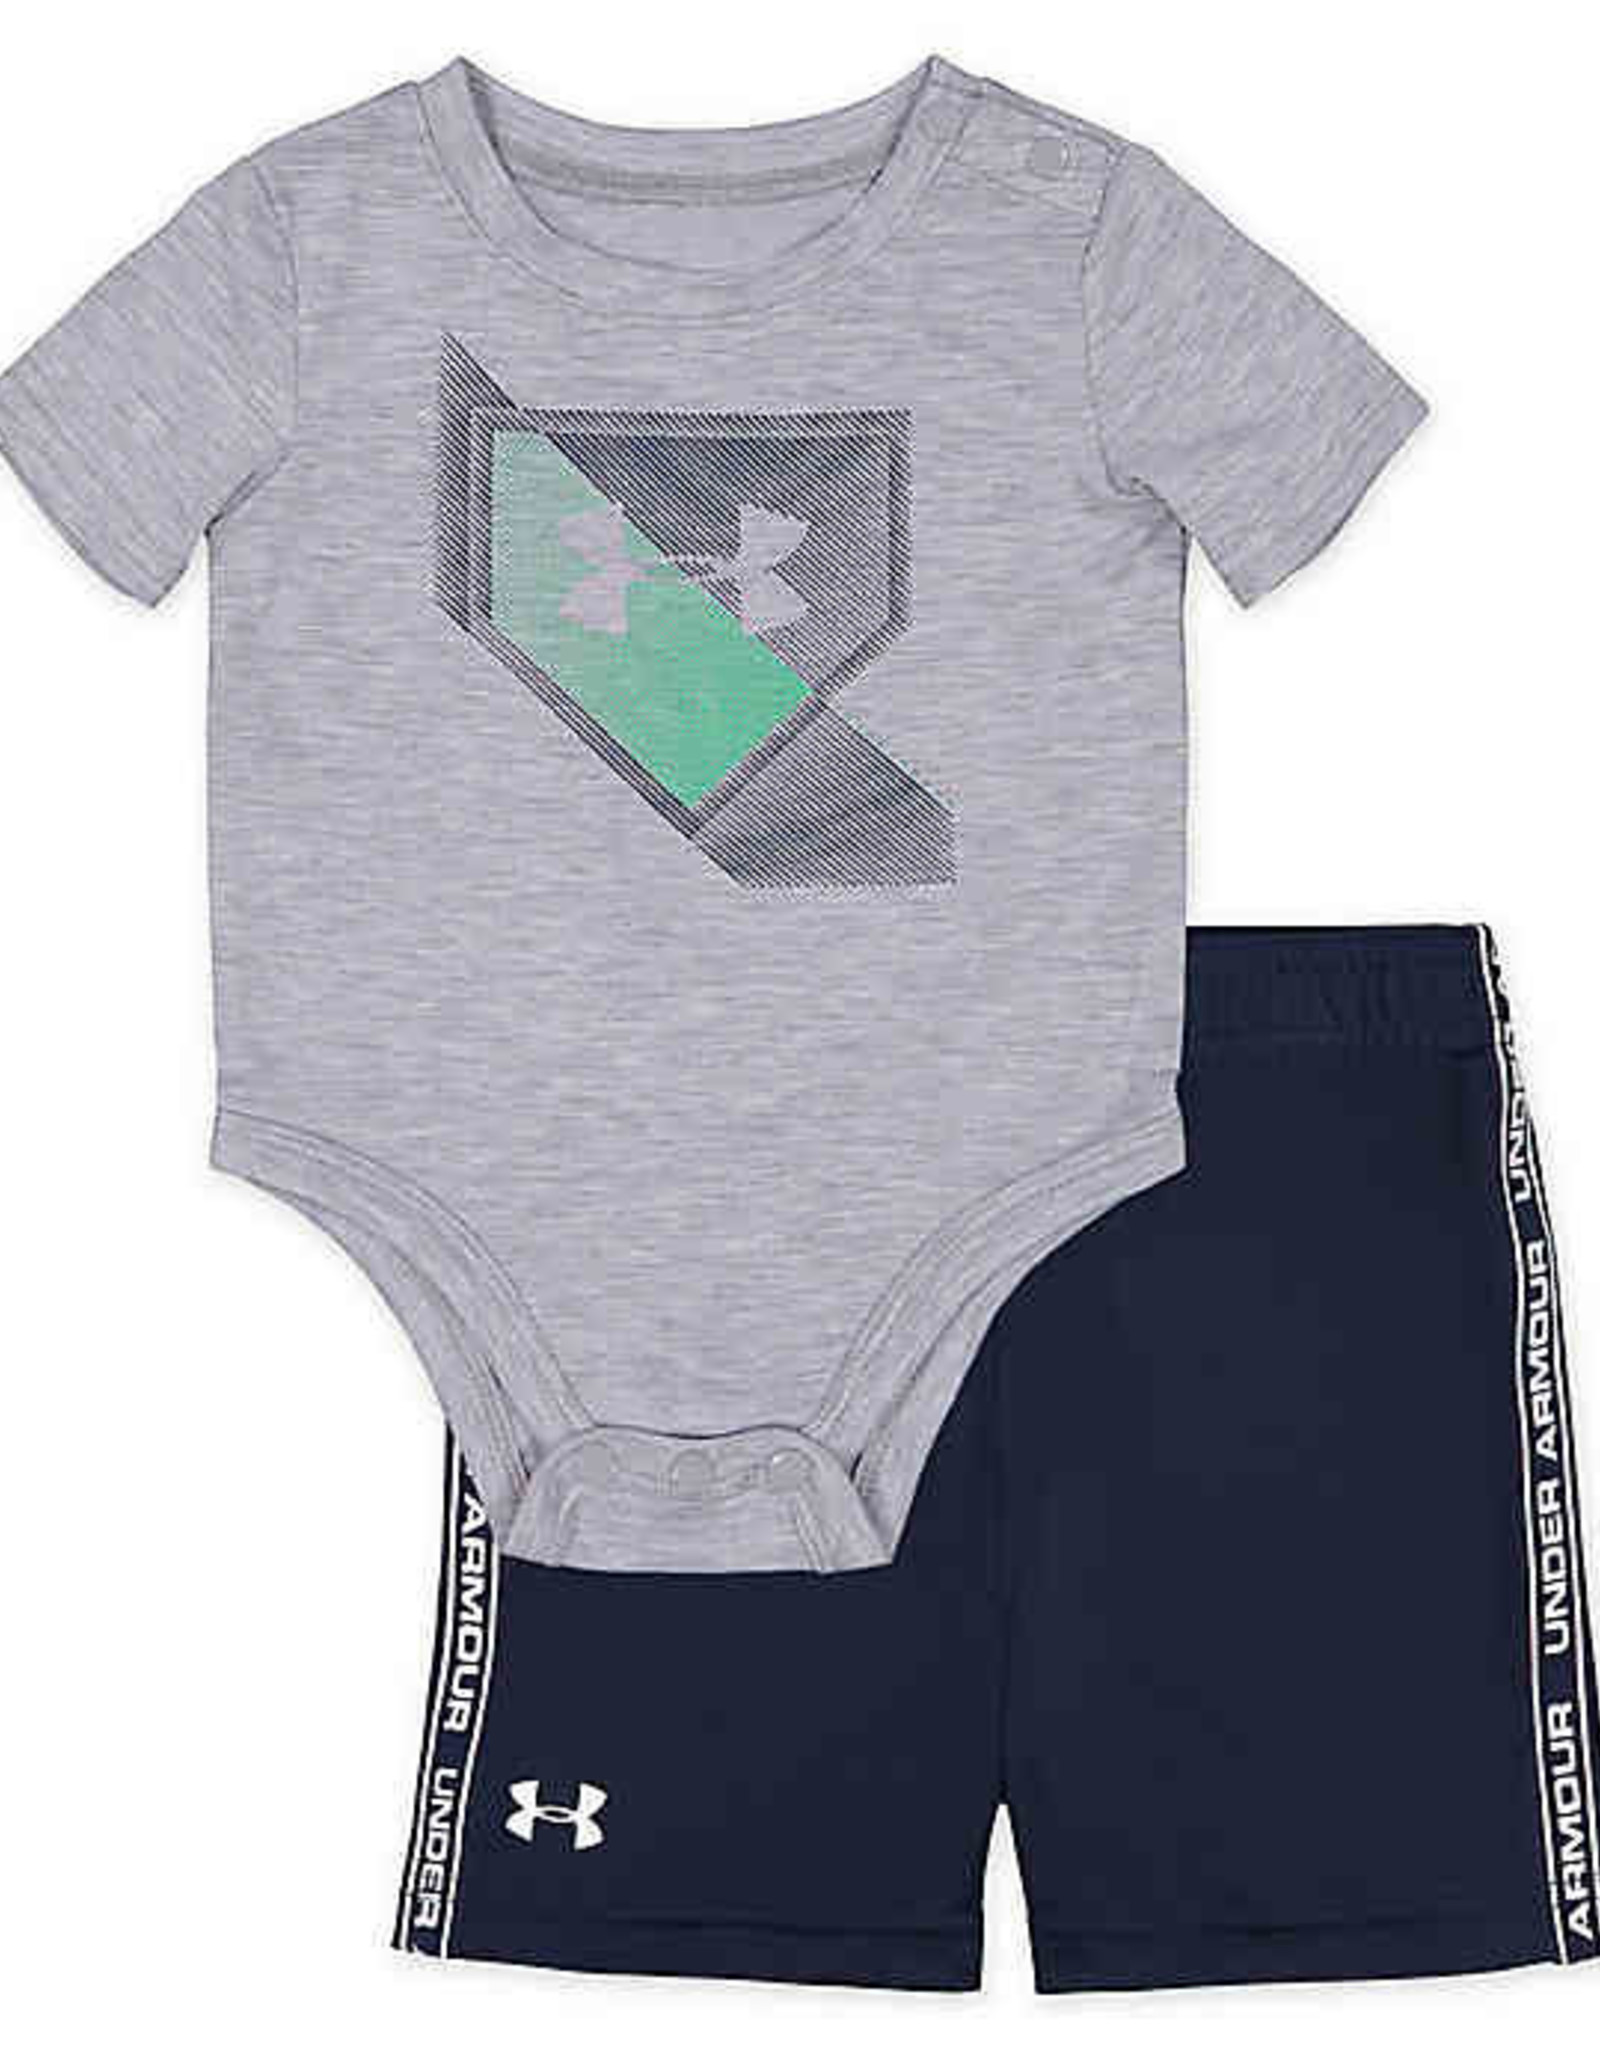 Under Armour 2Pc T-Shirt & Shorts Set Grey